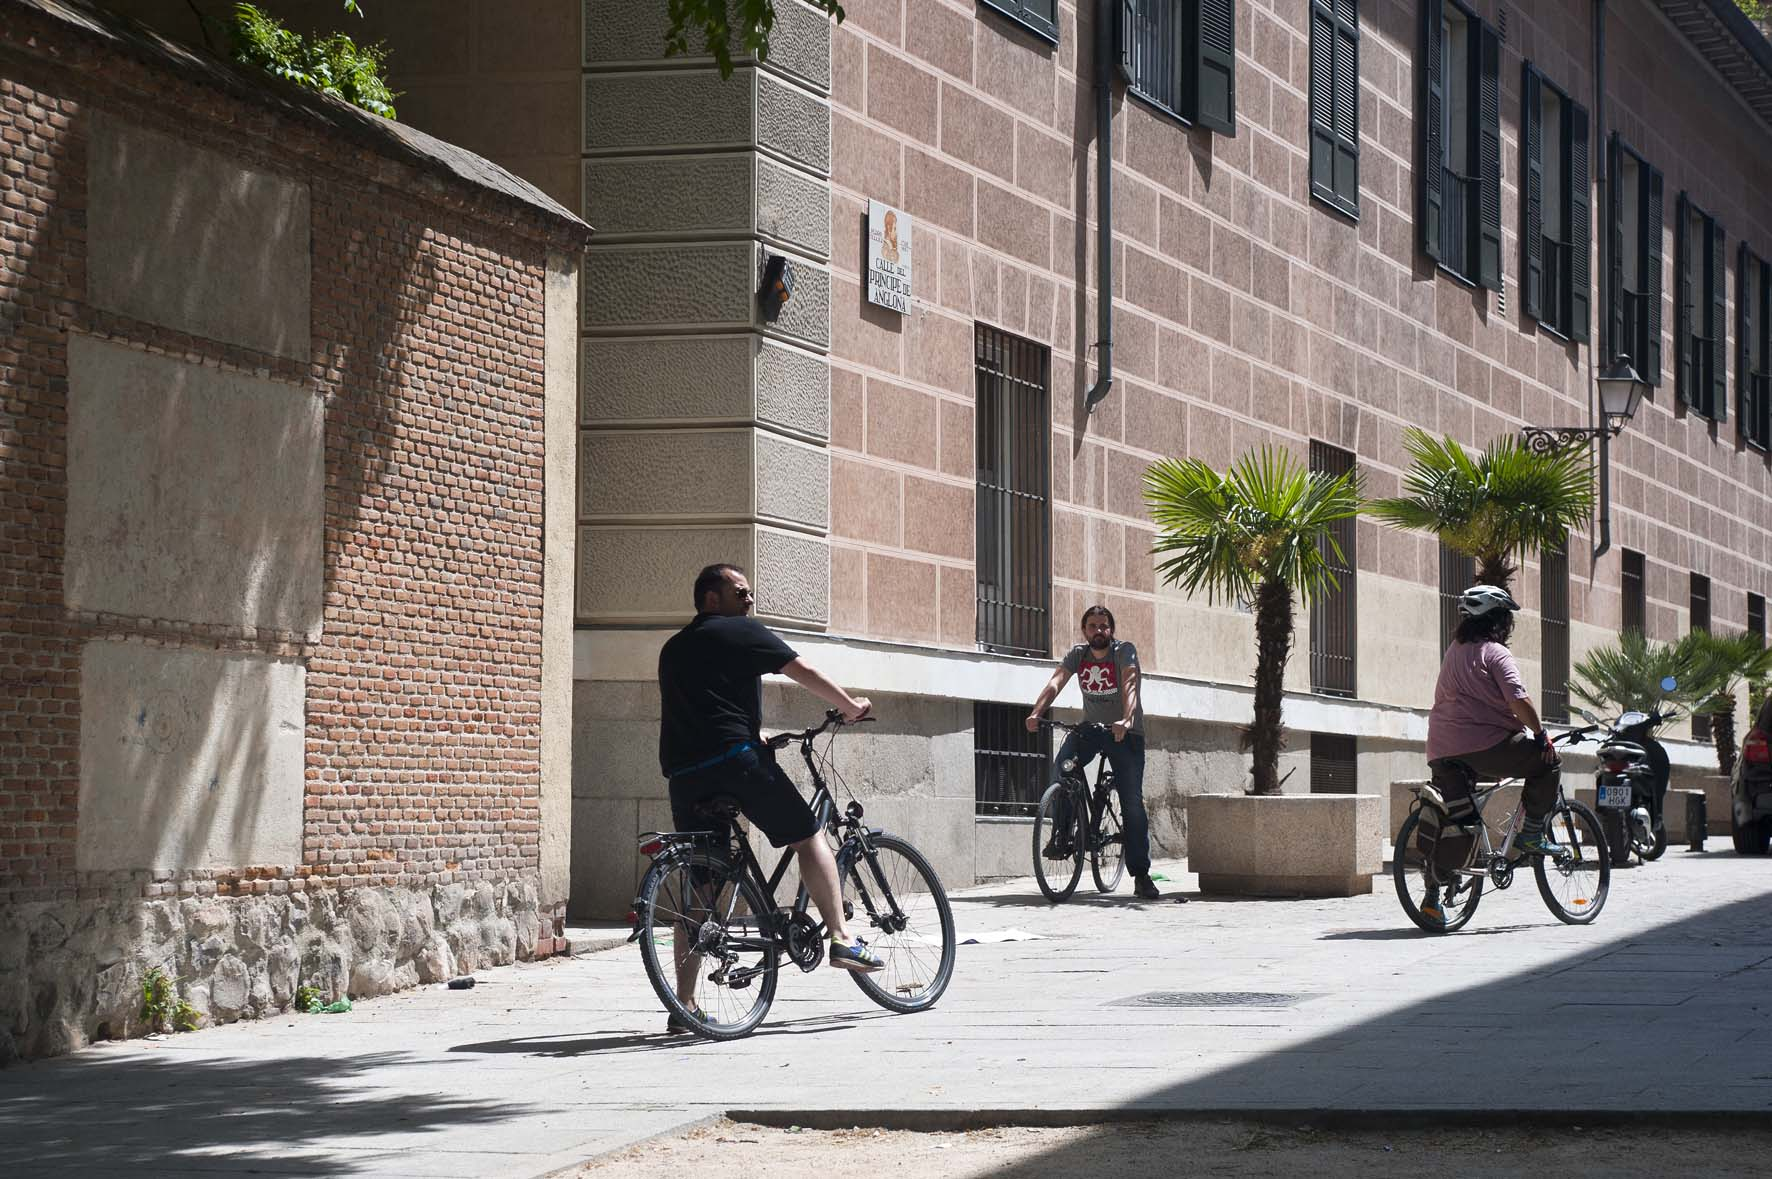 Ruta en bicicleta, Jardines escondidos de Madrid,Plaza de la paja